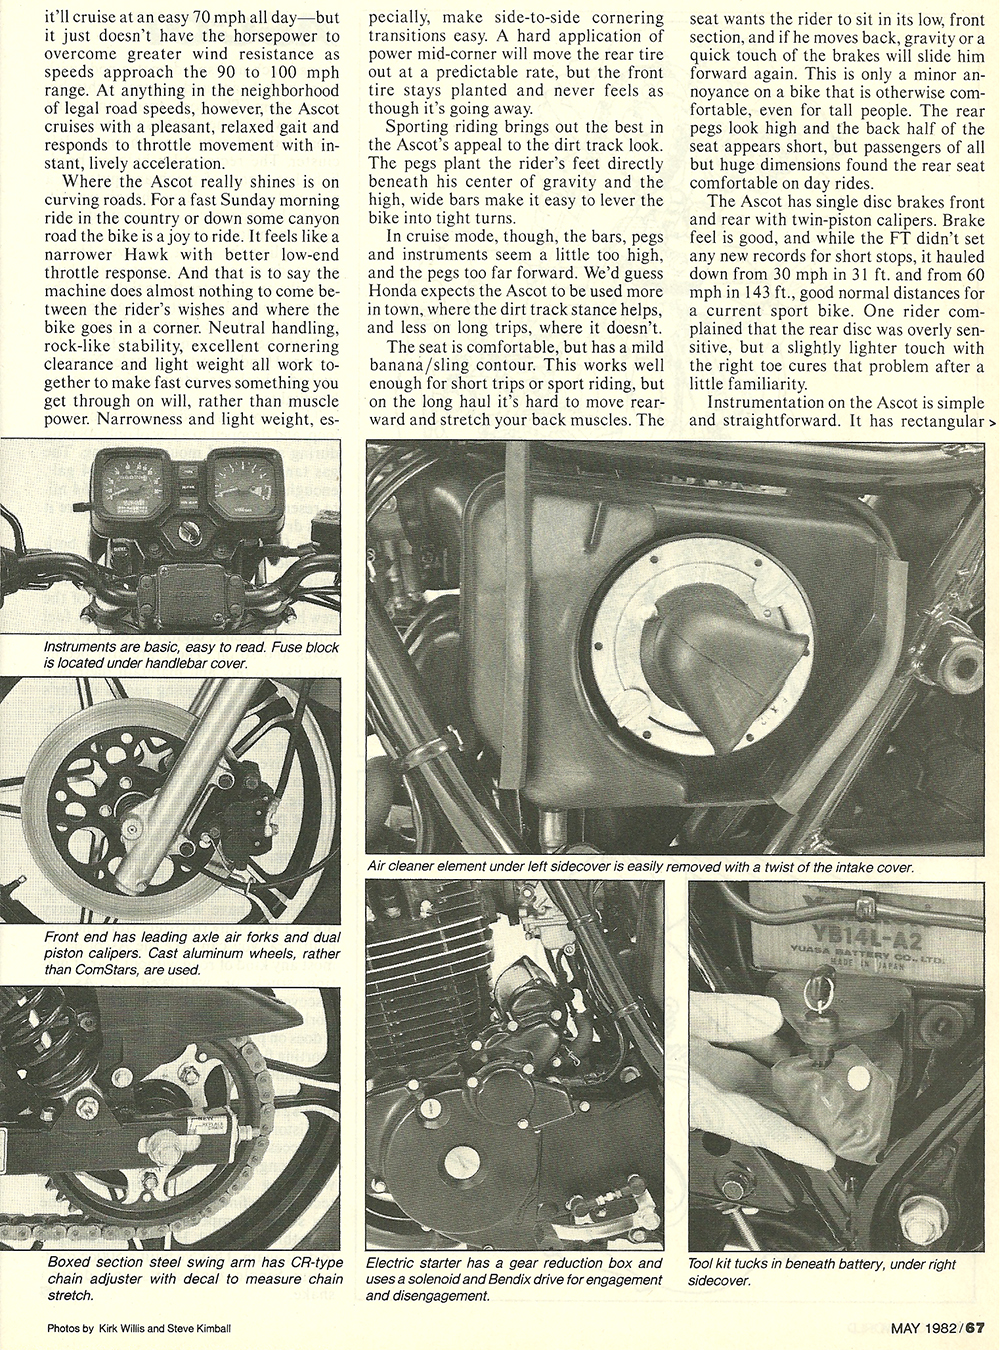 1982 Honda FT500 Ascot road test 06.jpg